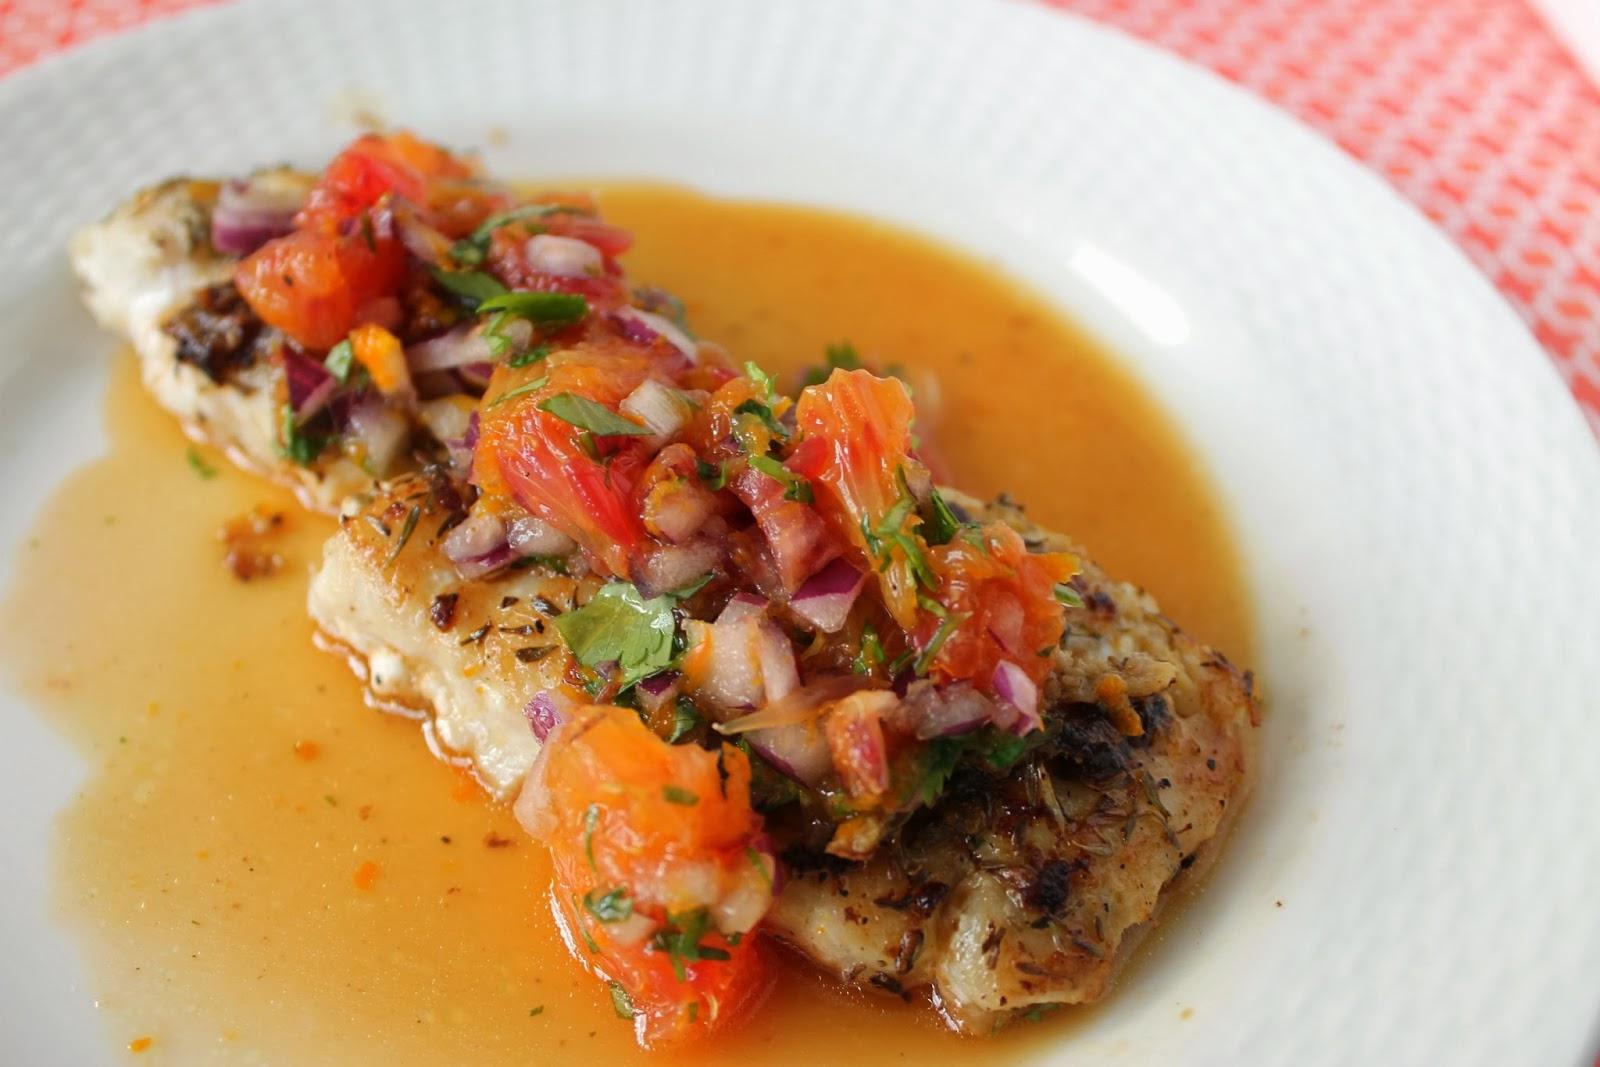 Sear-Roasted Haddock with Blood Orange Salsa